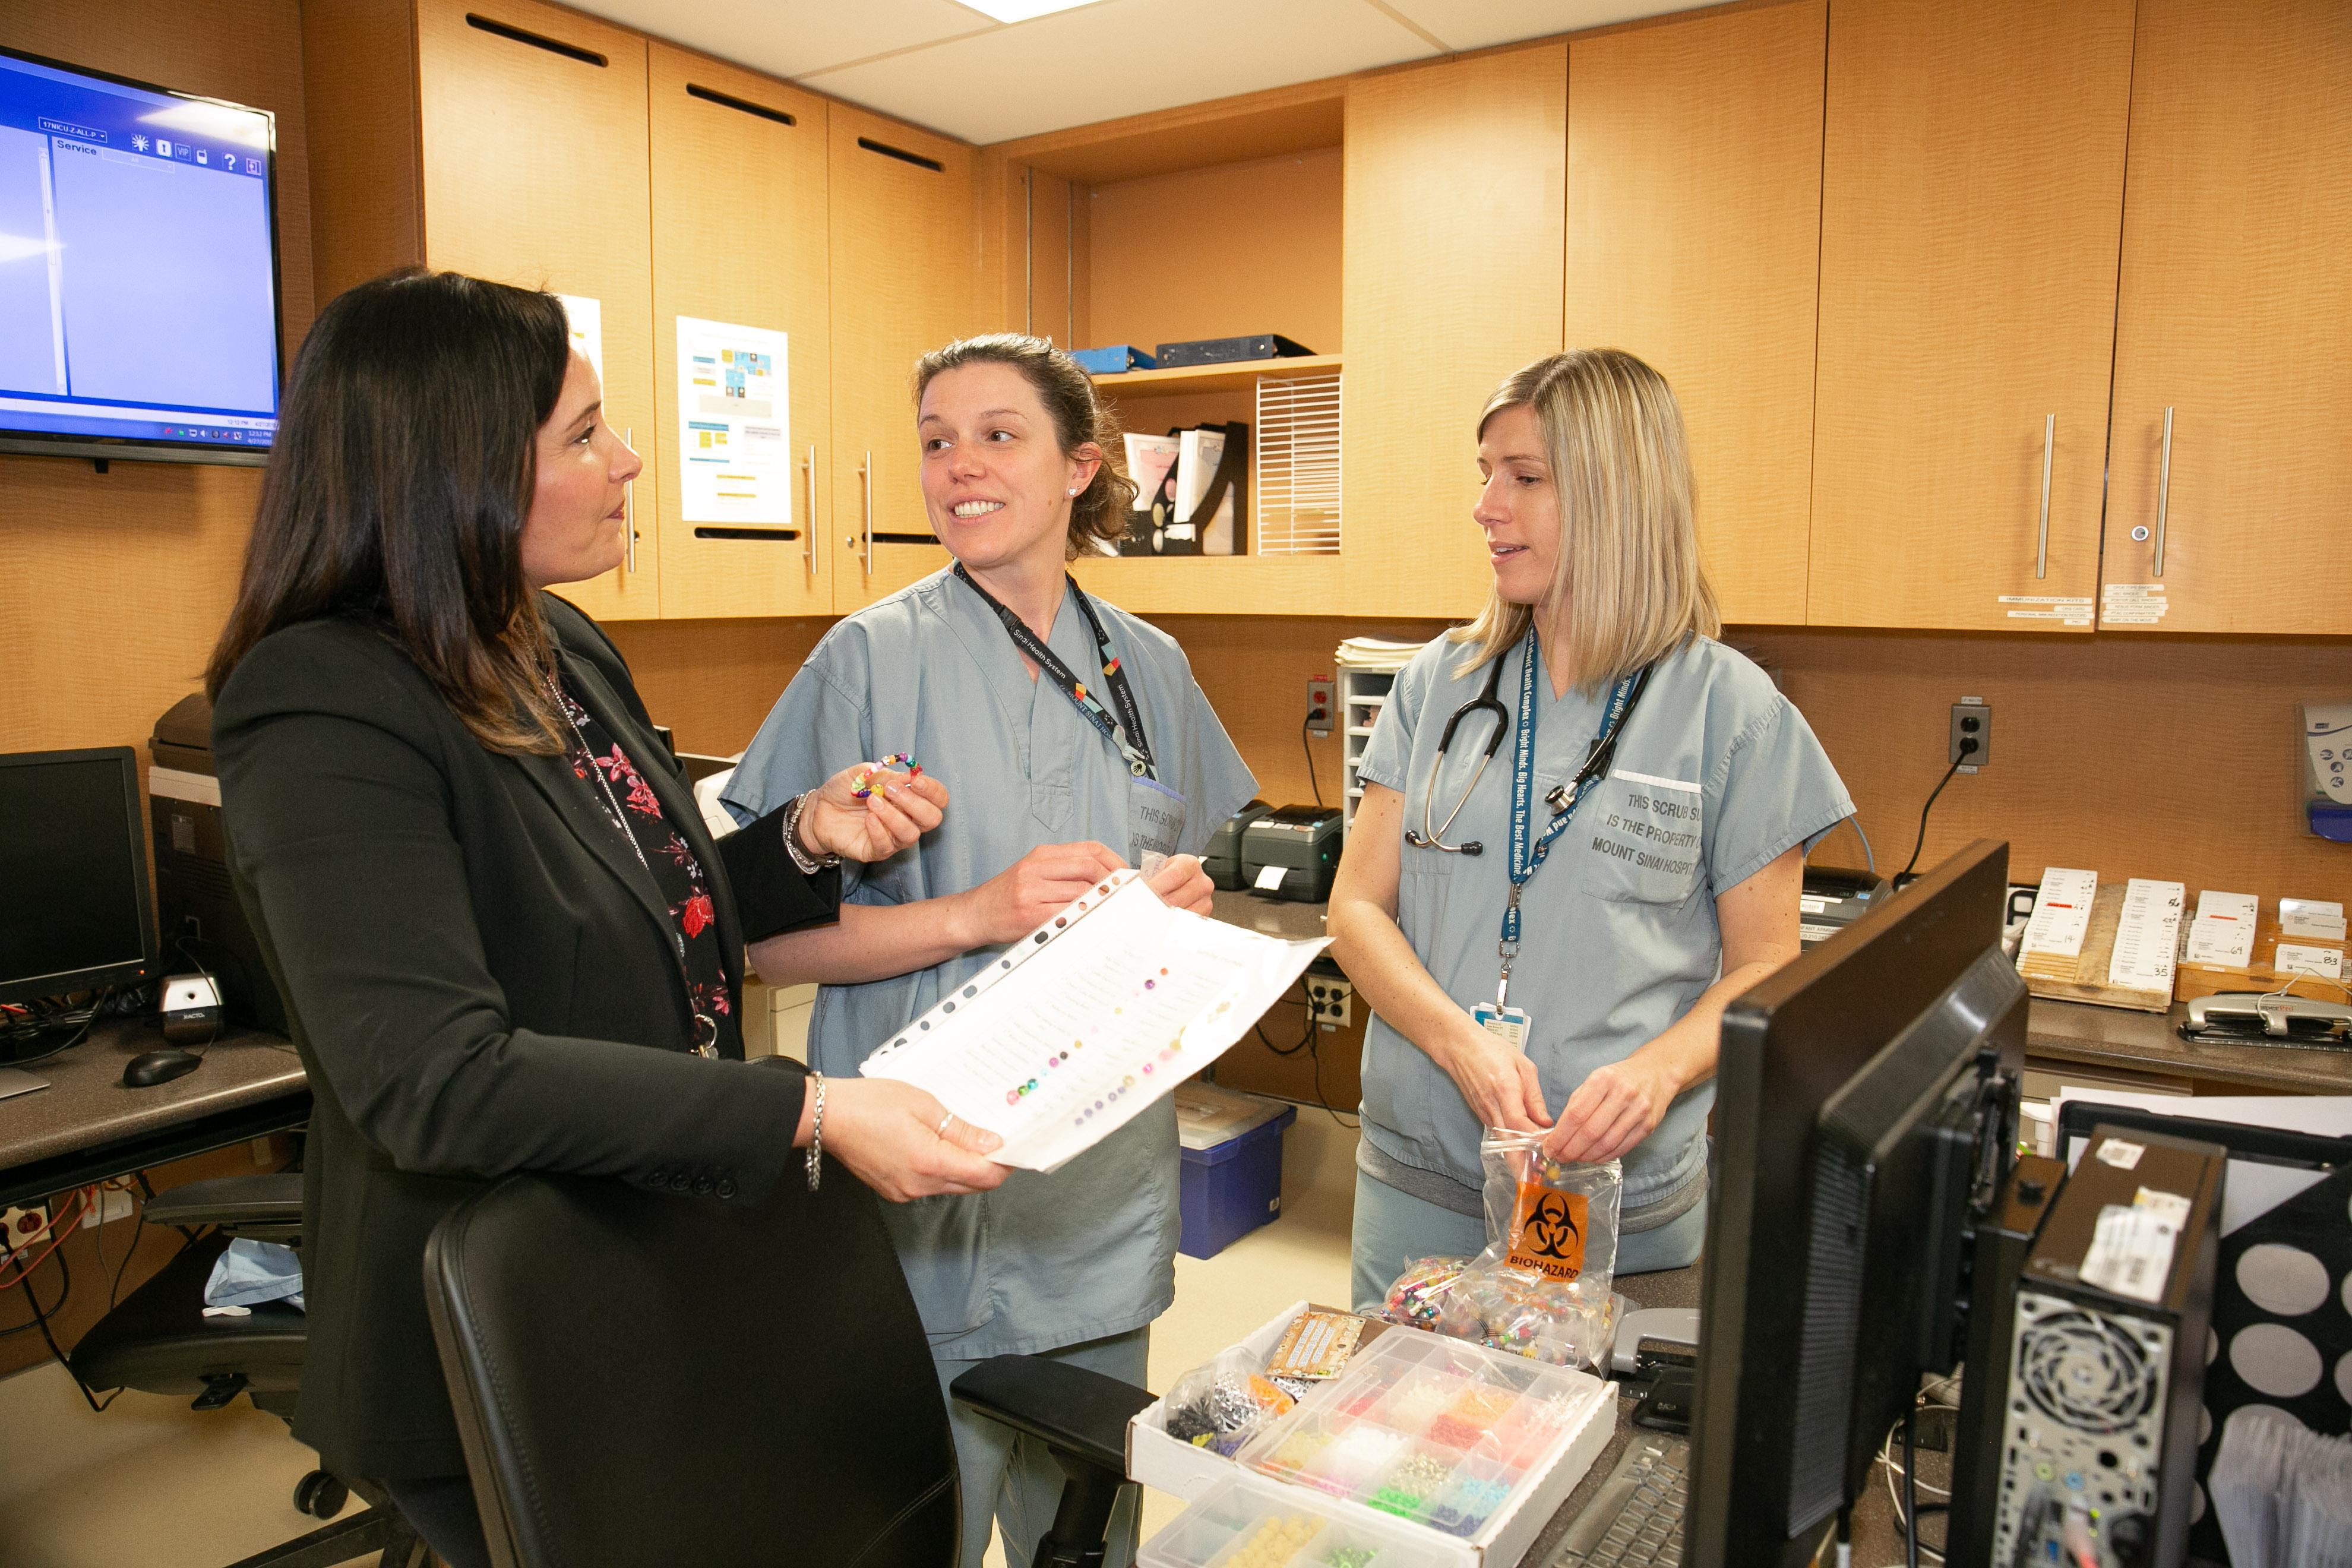 Three nurses on a unit interacting